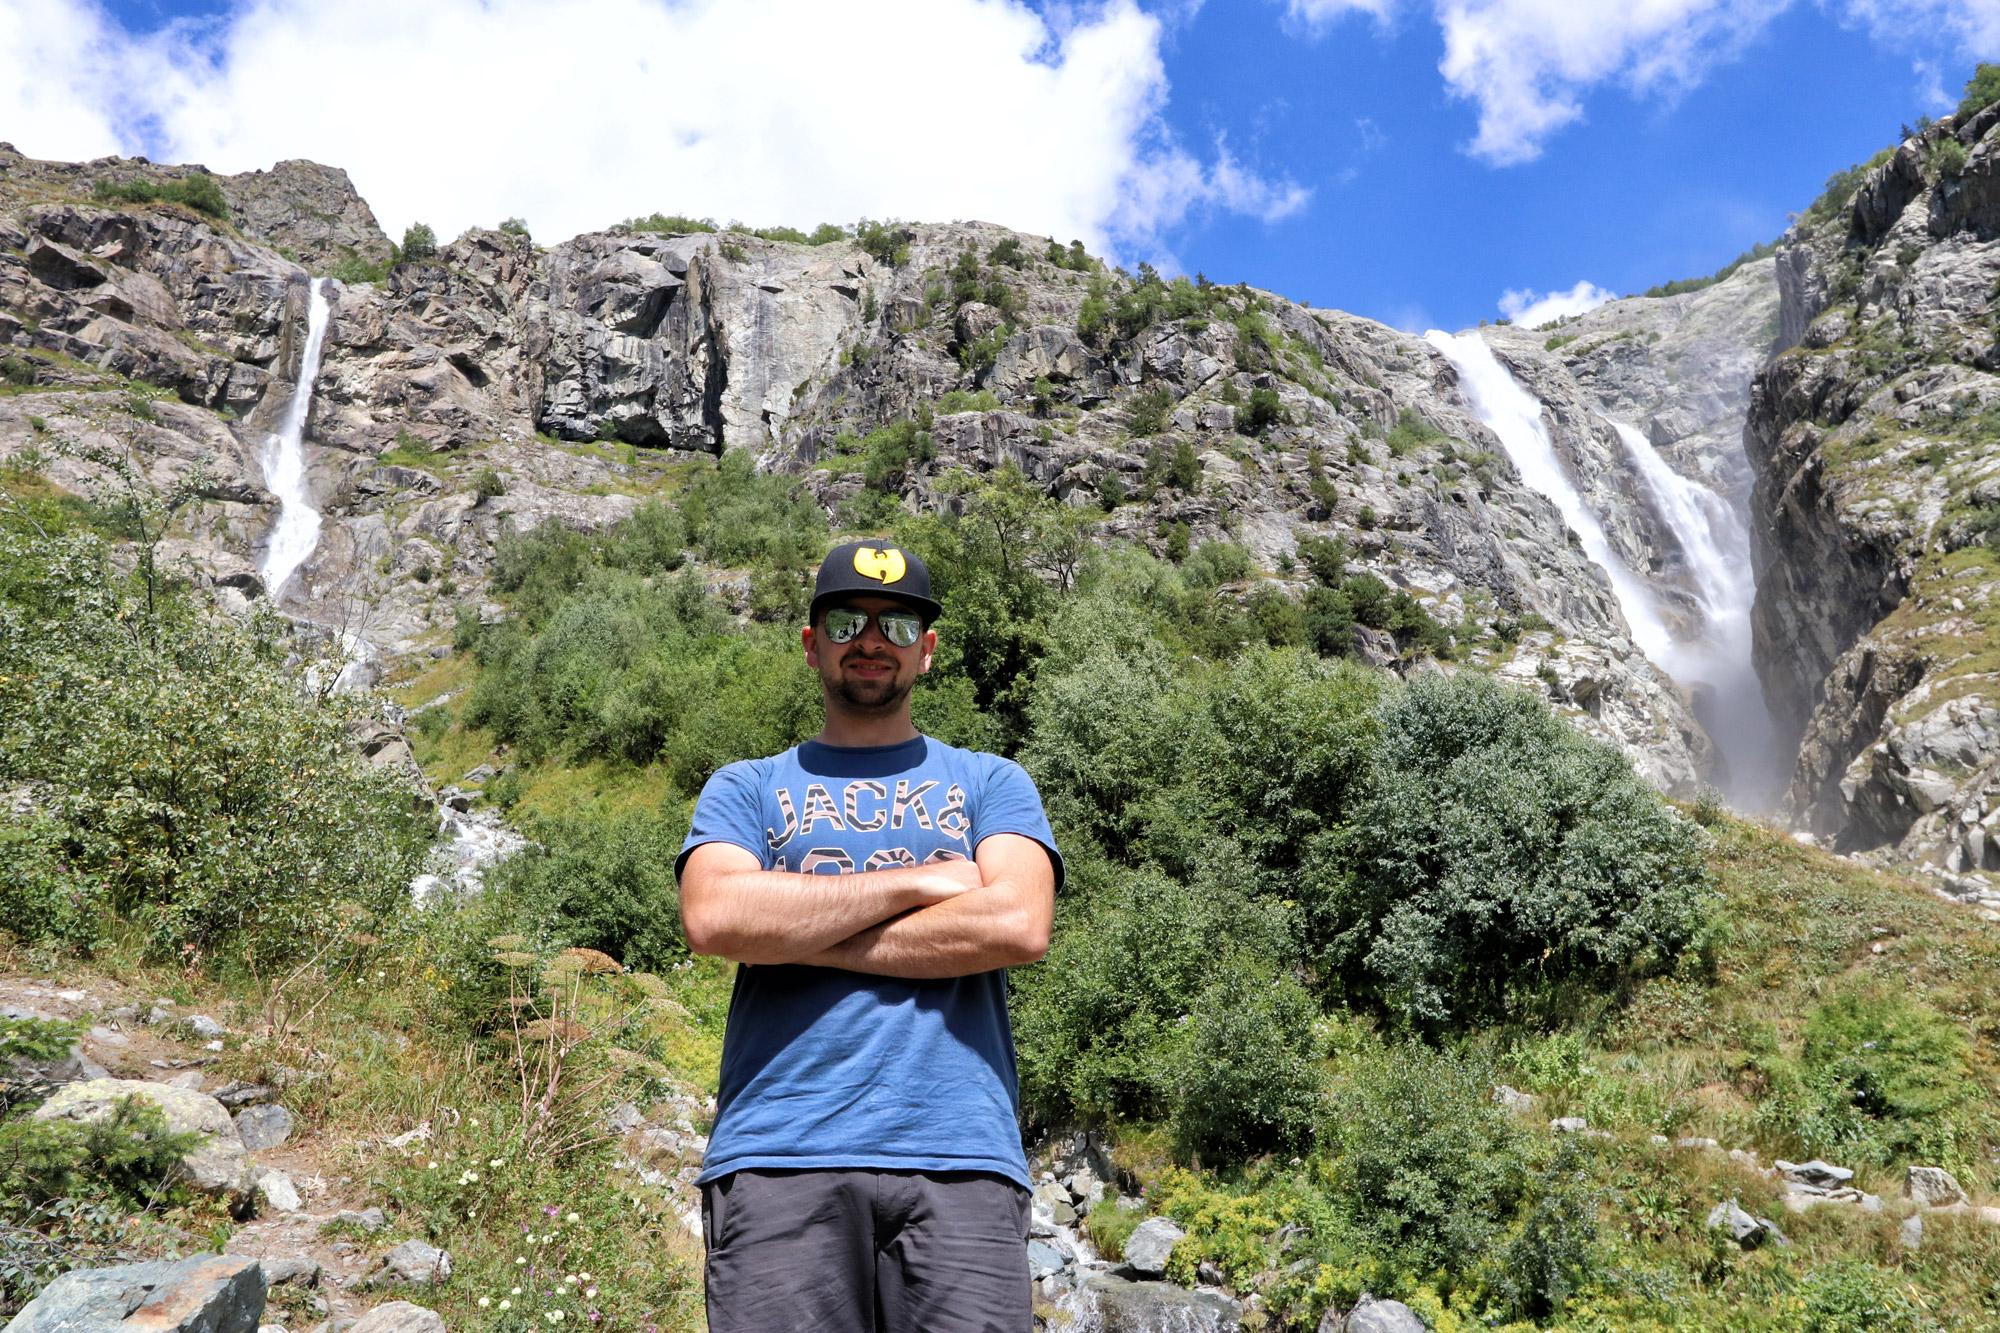 Georgië reisverslag - Wandelen naar de Shudgra waterval